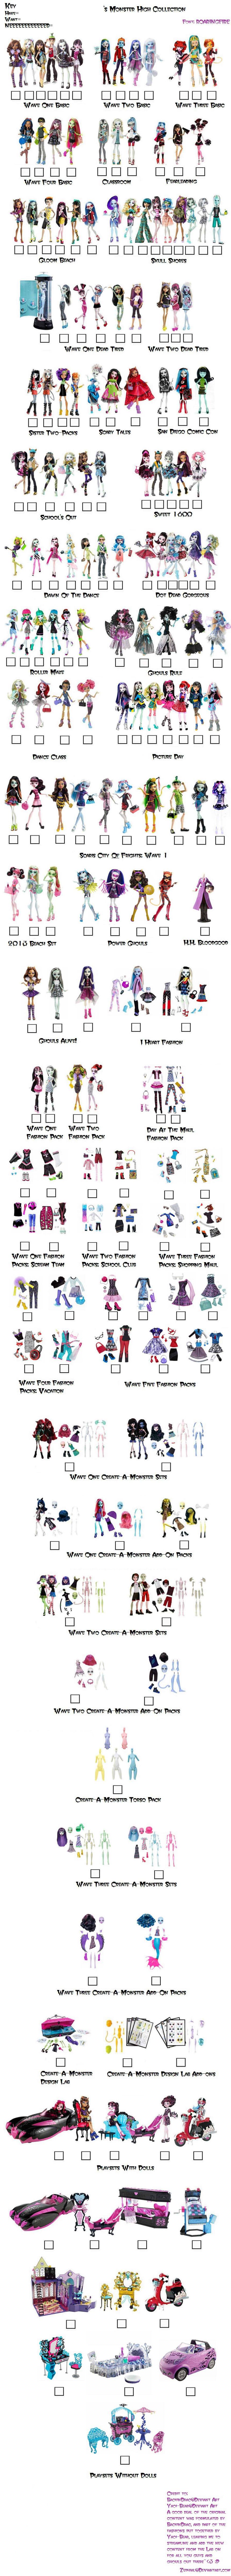 Monster High Doll Check